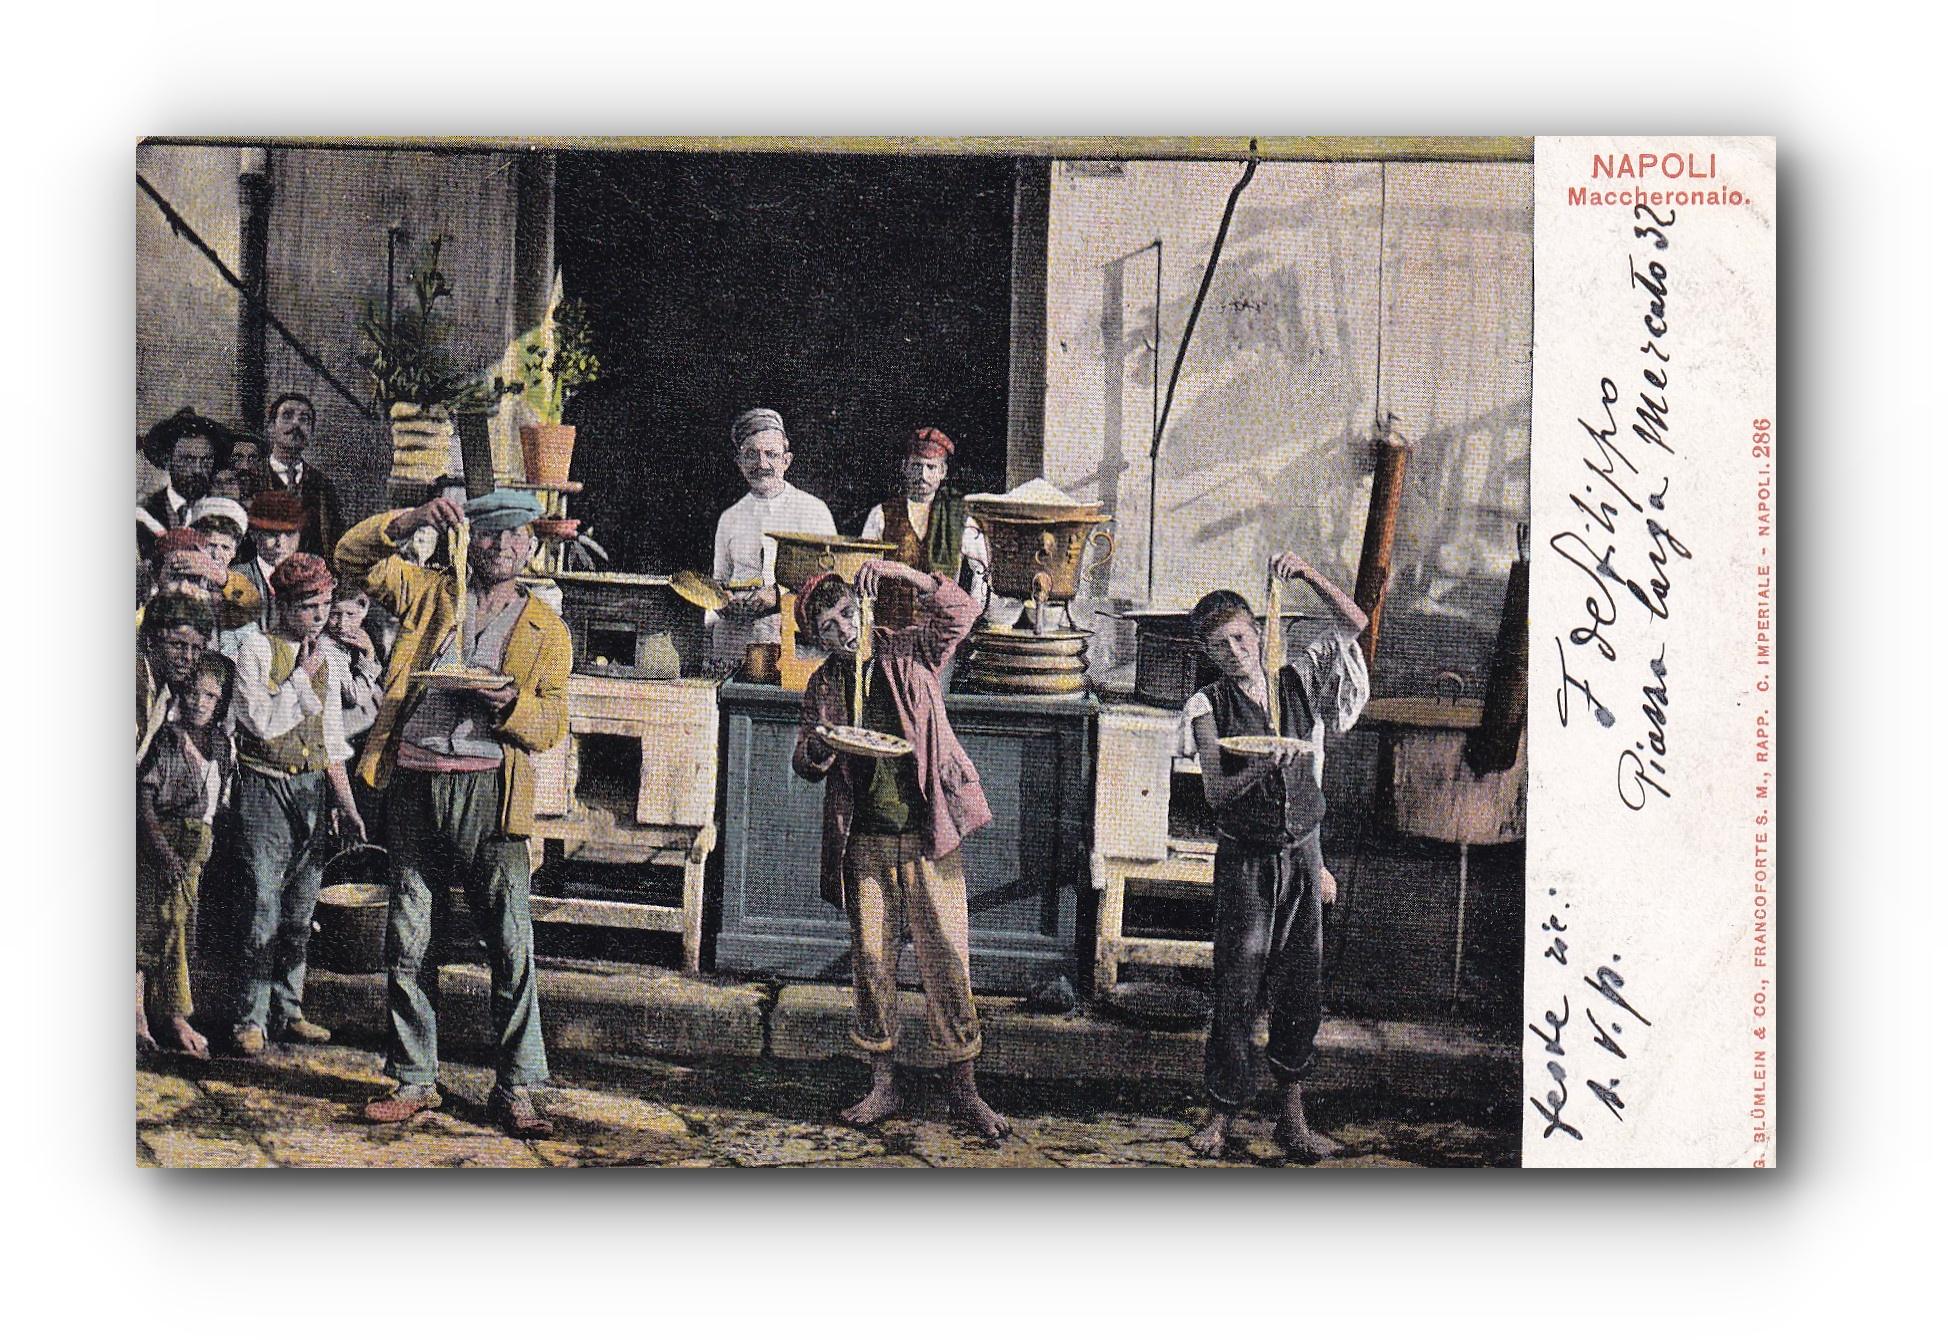 NAPOLI - 18.06.1903 - Die Spaghetti Esser - Les mangeurs de spaghettis - The Spaghetti Eaters